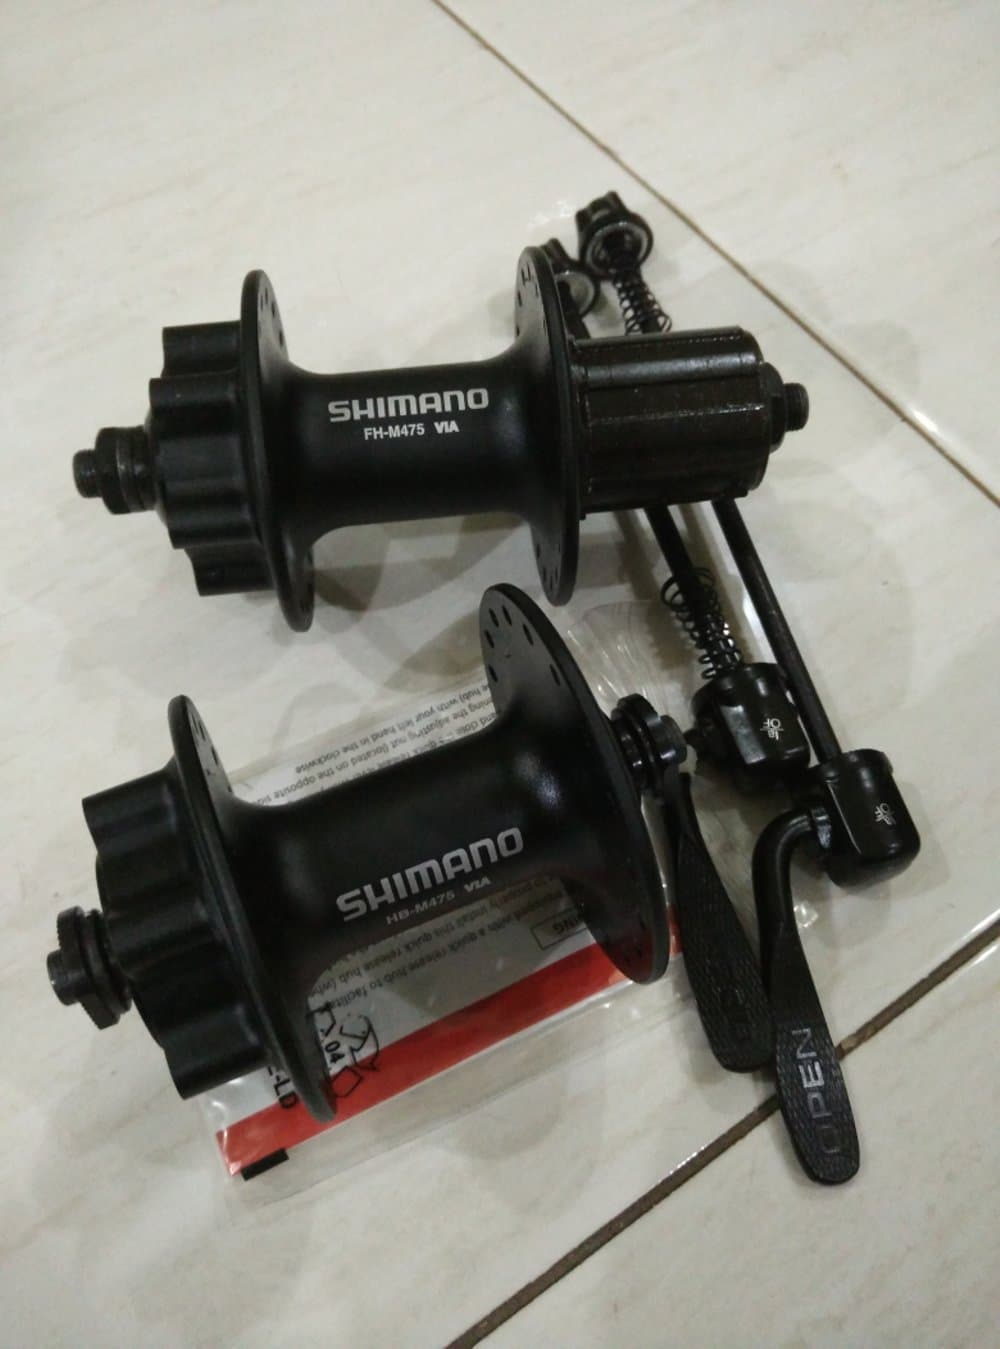 Jual Hub Freehub Sepeda Gunung Shimano M475 6 Bolt Toolkit 11 In 1 Hitam